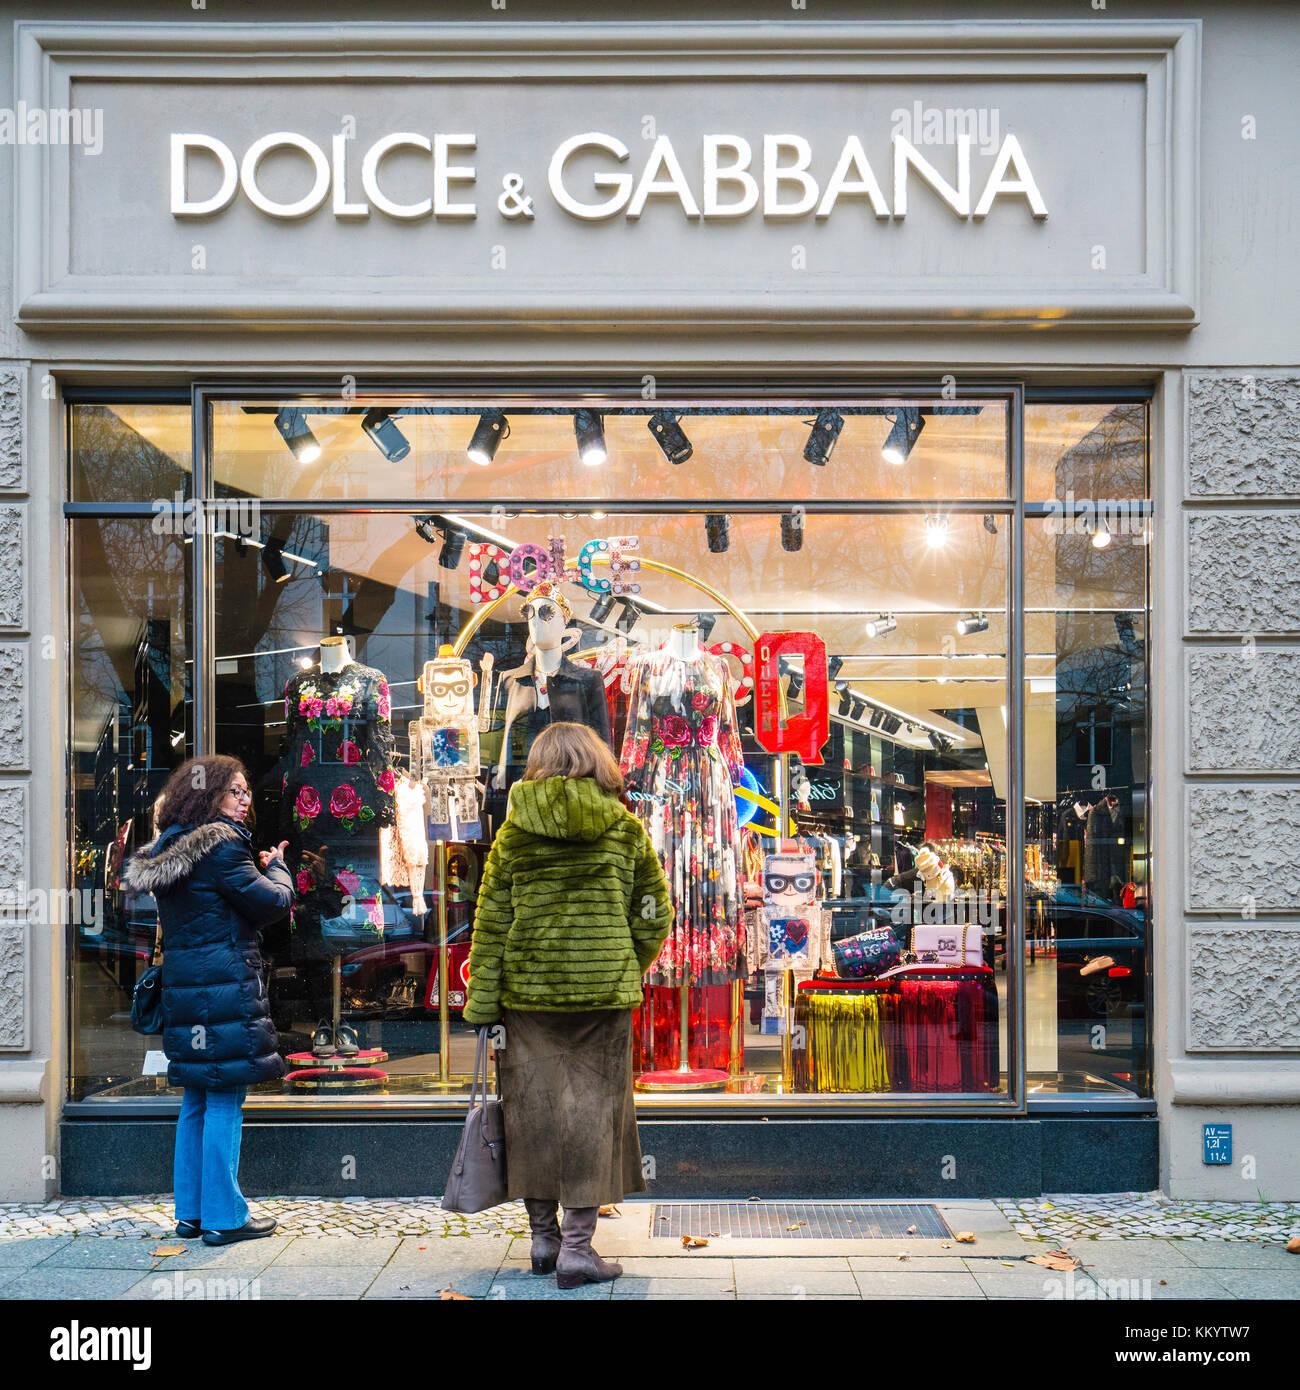 Dolce & Gabbana boutique on famous Kurfurstendamm shopping street in Berlin, Germany. - Stock Image